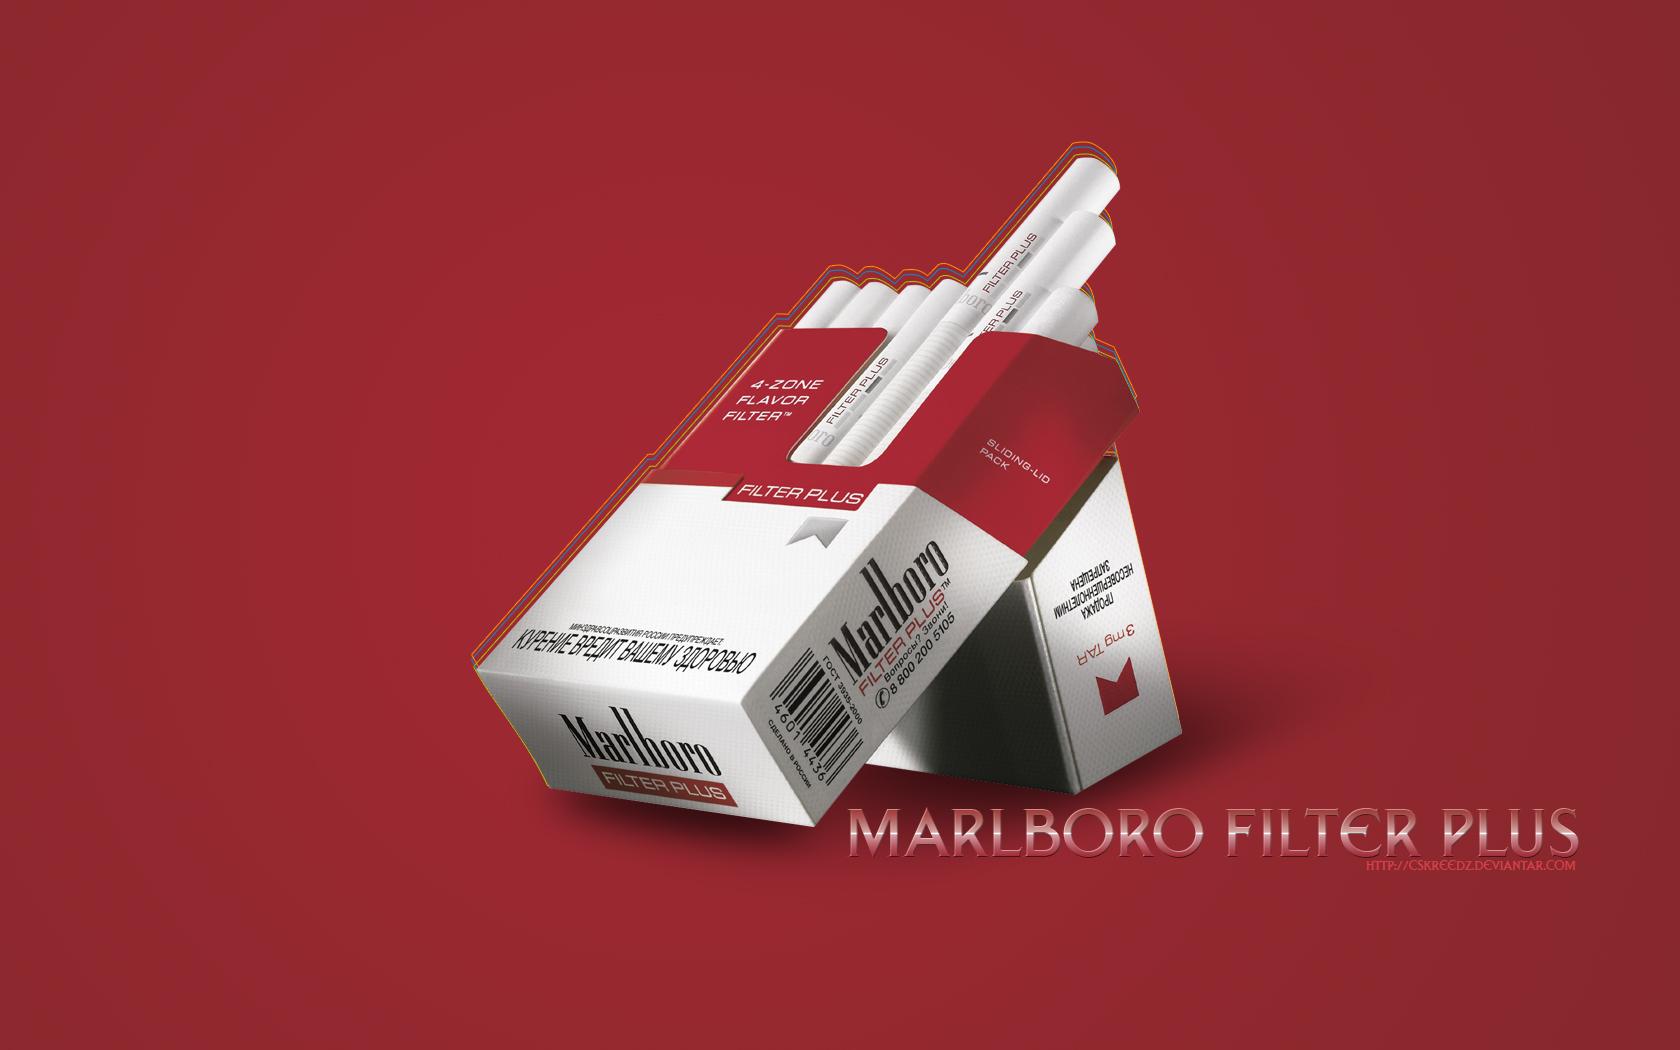 wallpaper marlboro filter plus by cskreedz customization wallpaper 1680x1050